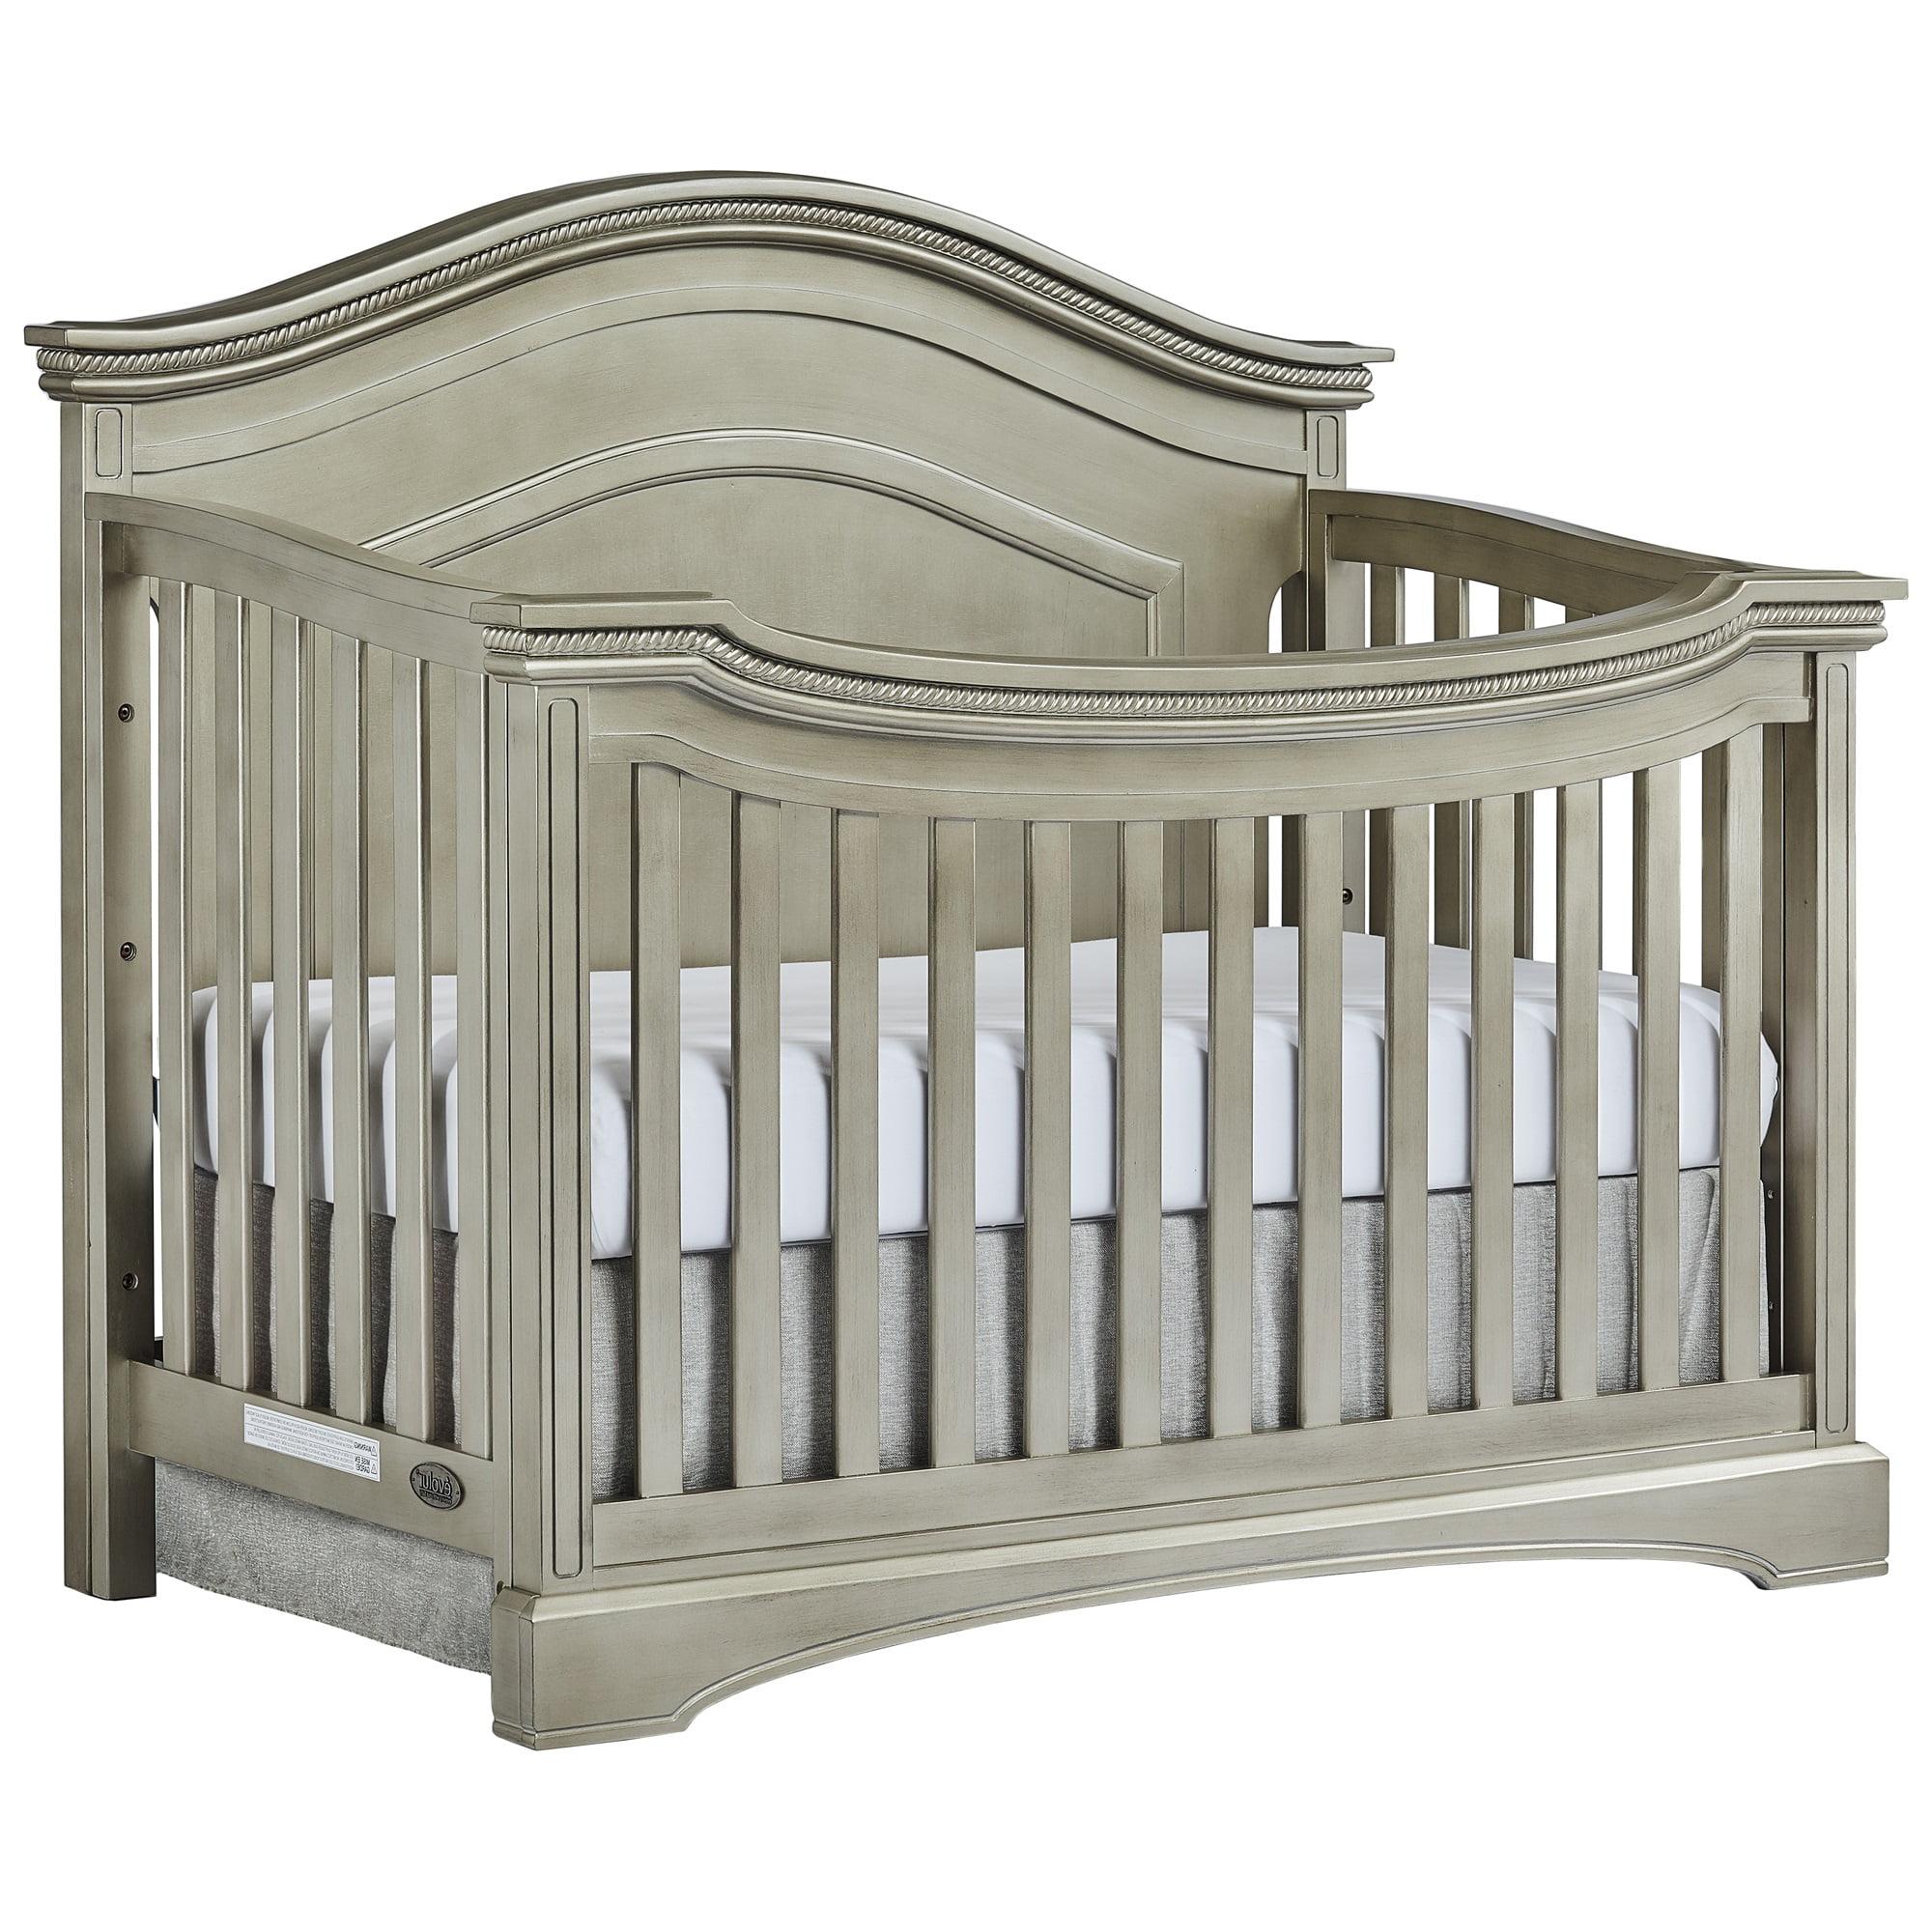 Evolur Adora Curve Top Convertible Crib, Storm Gray by evolur